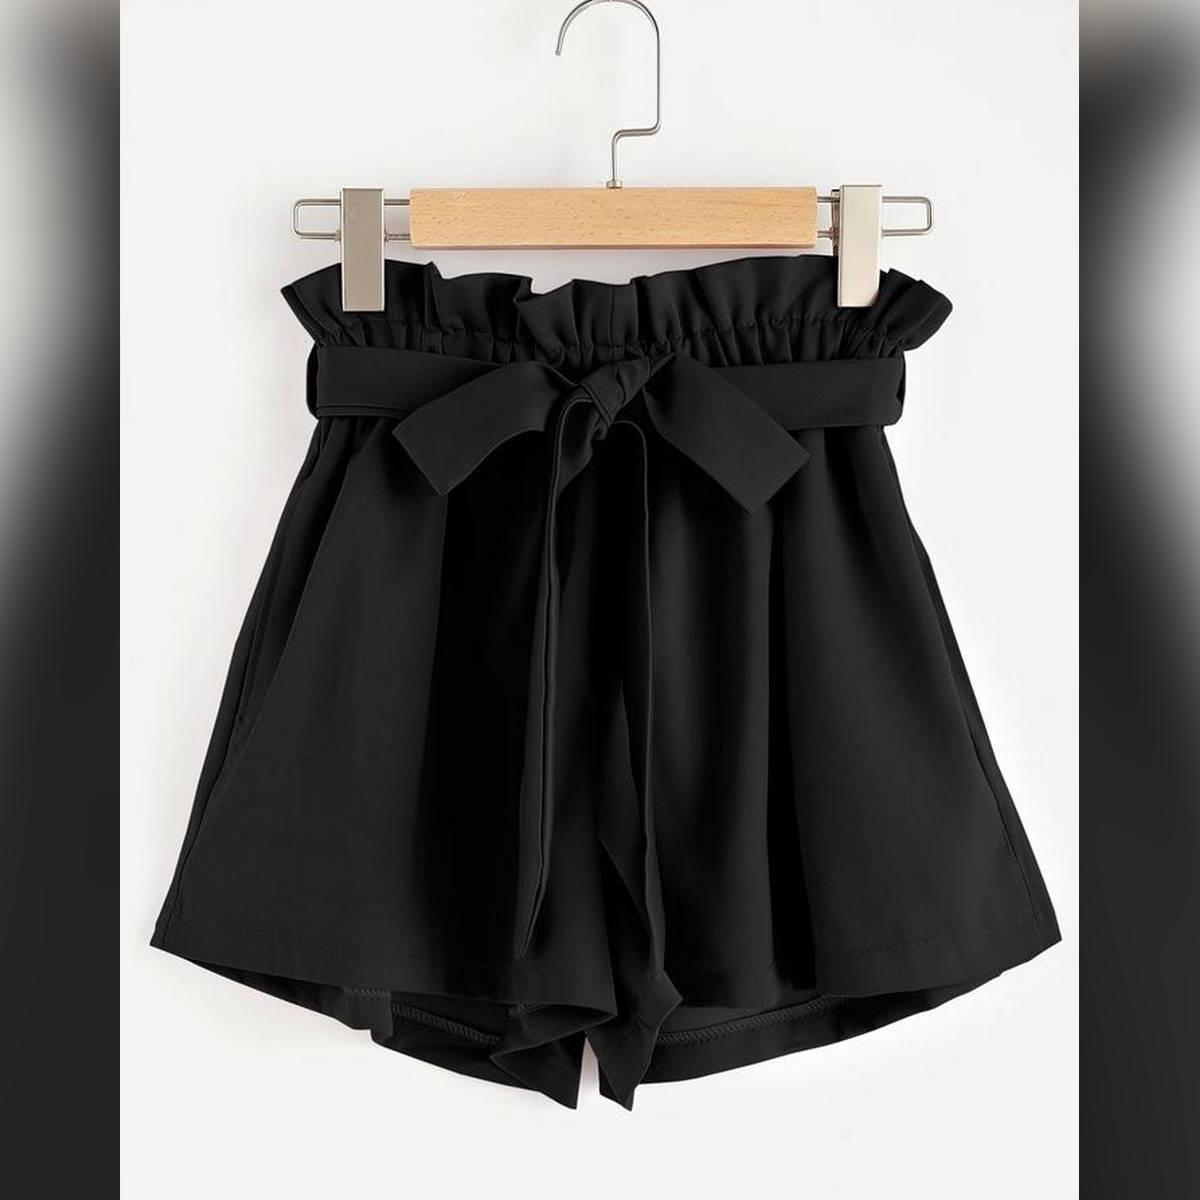 Black Tie Waist Short Pant for Women